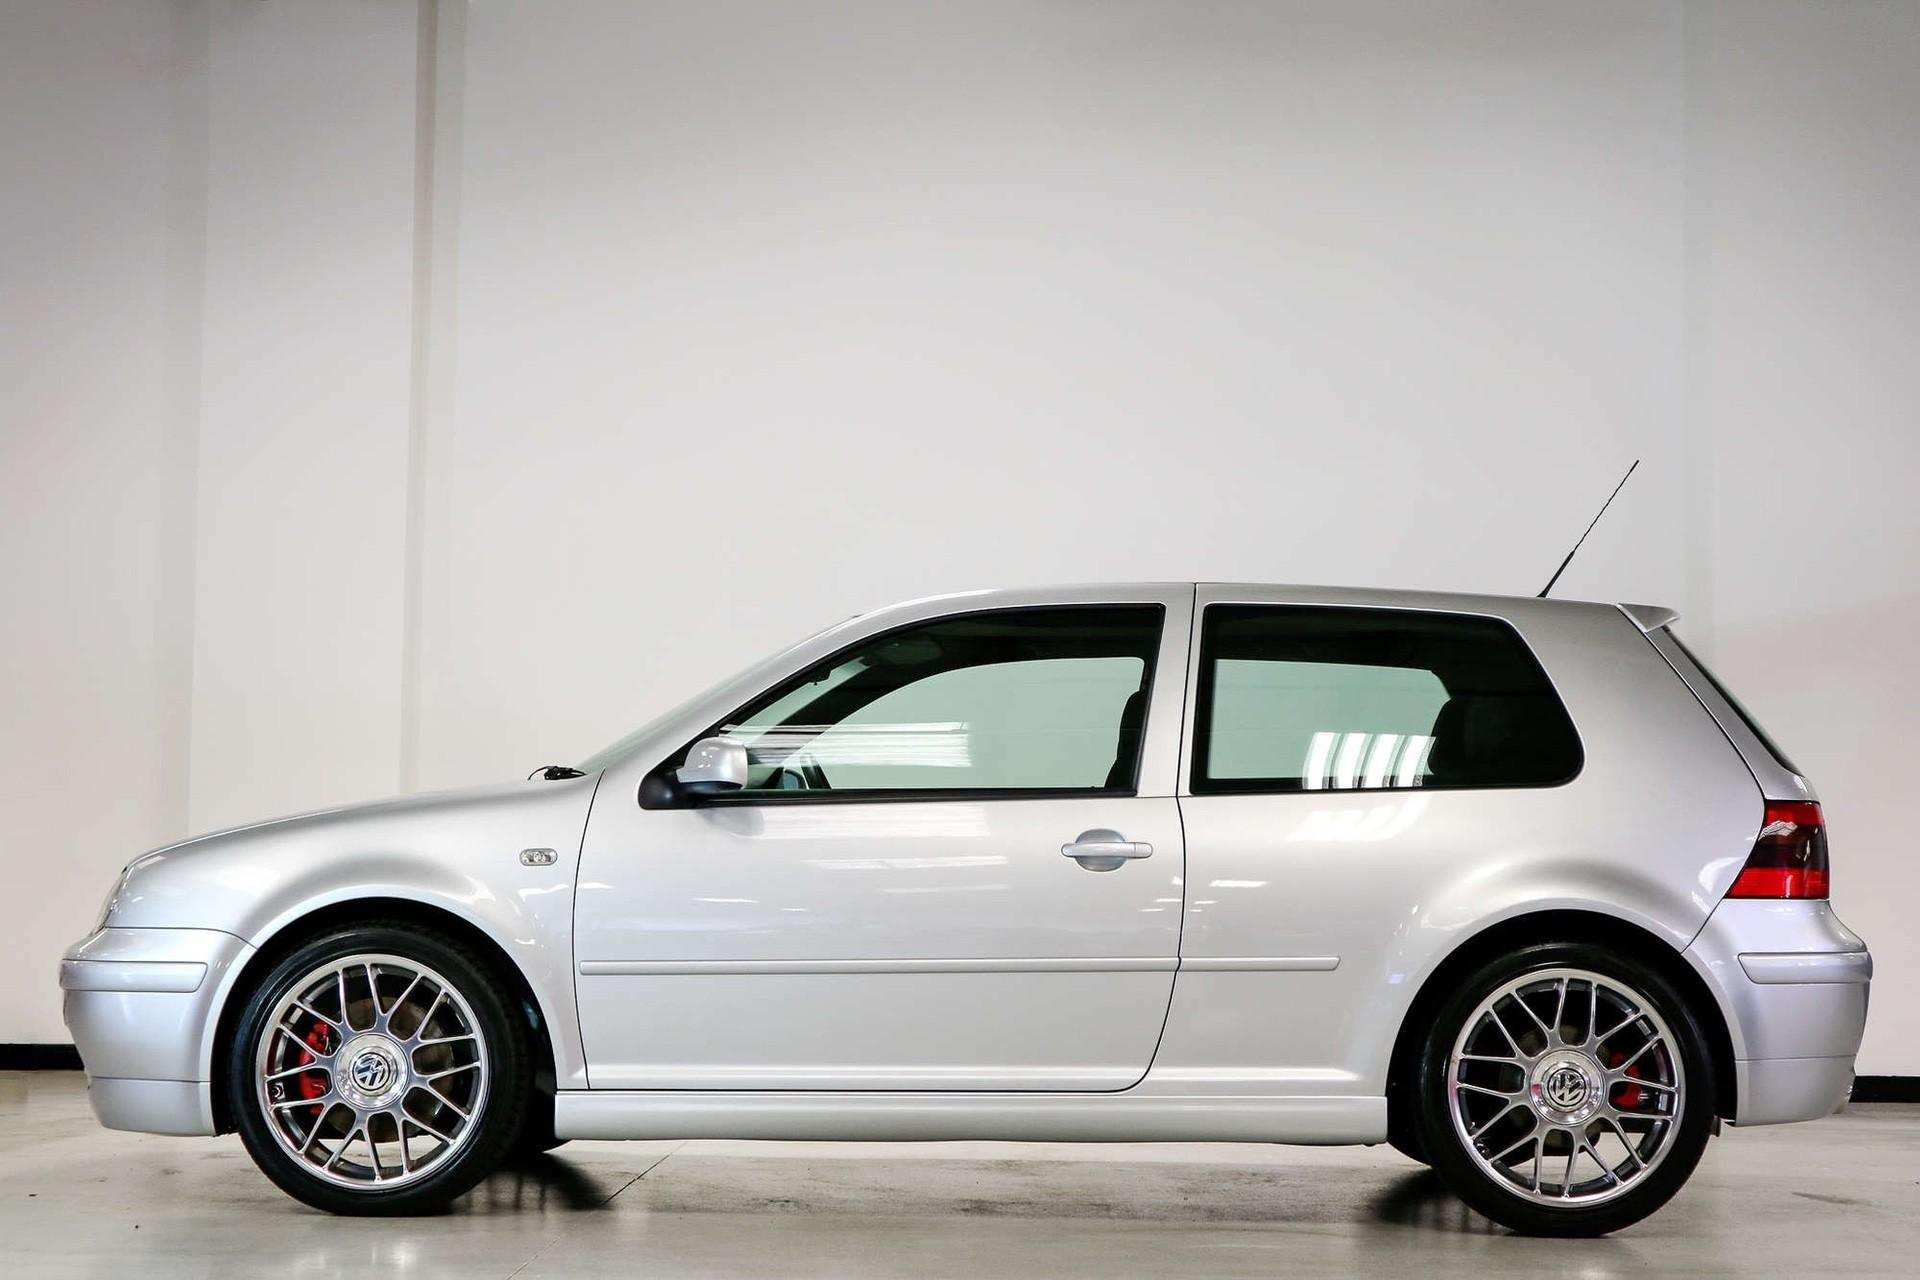 2002_VW_Golf_GTI_25th_Anniversary_Edition_sale-0004